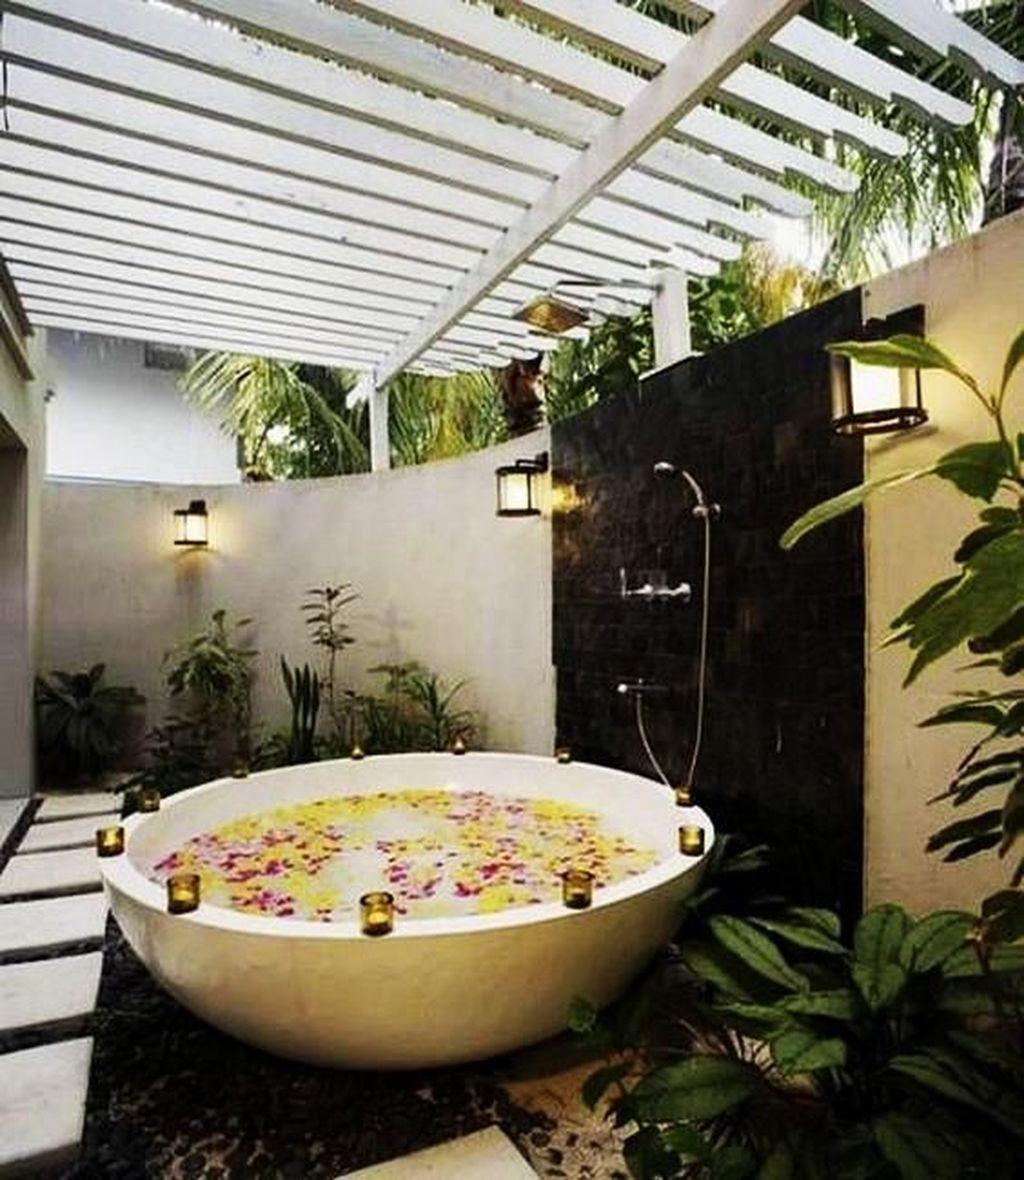 Creative Outdoor Bathroom Design Ideas For Enjoying Summer 08